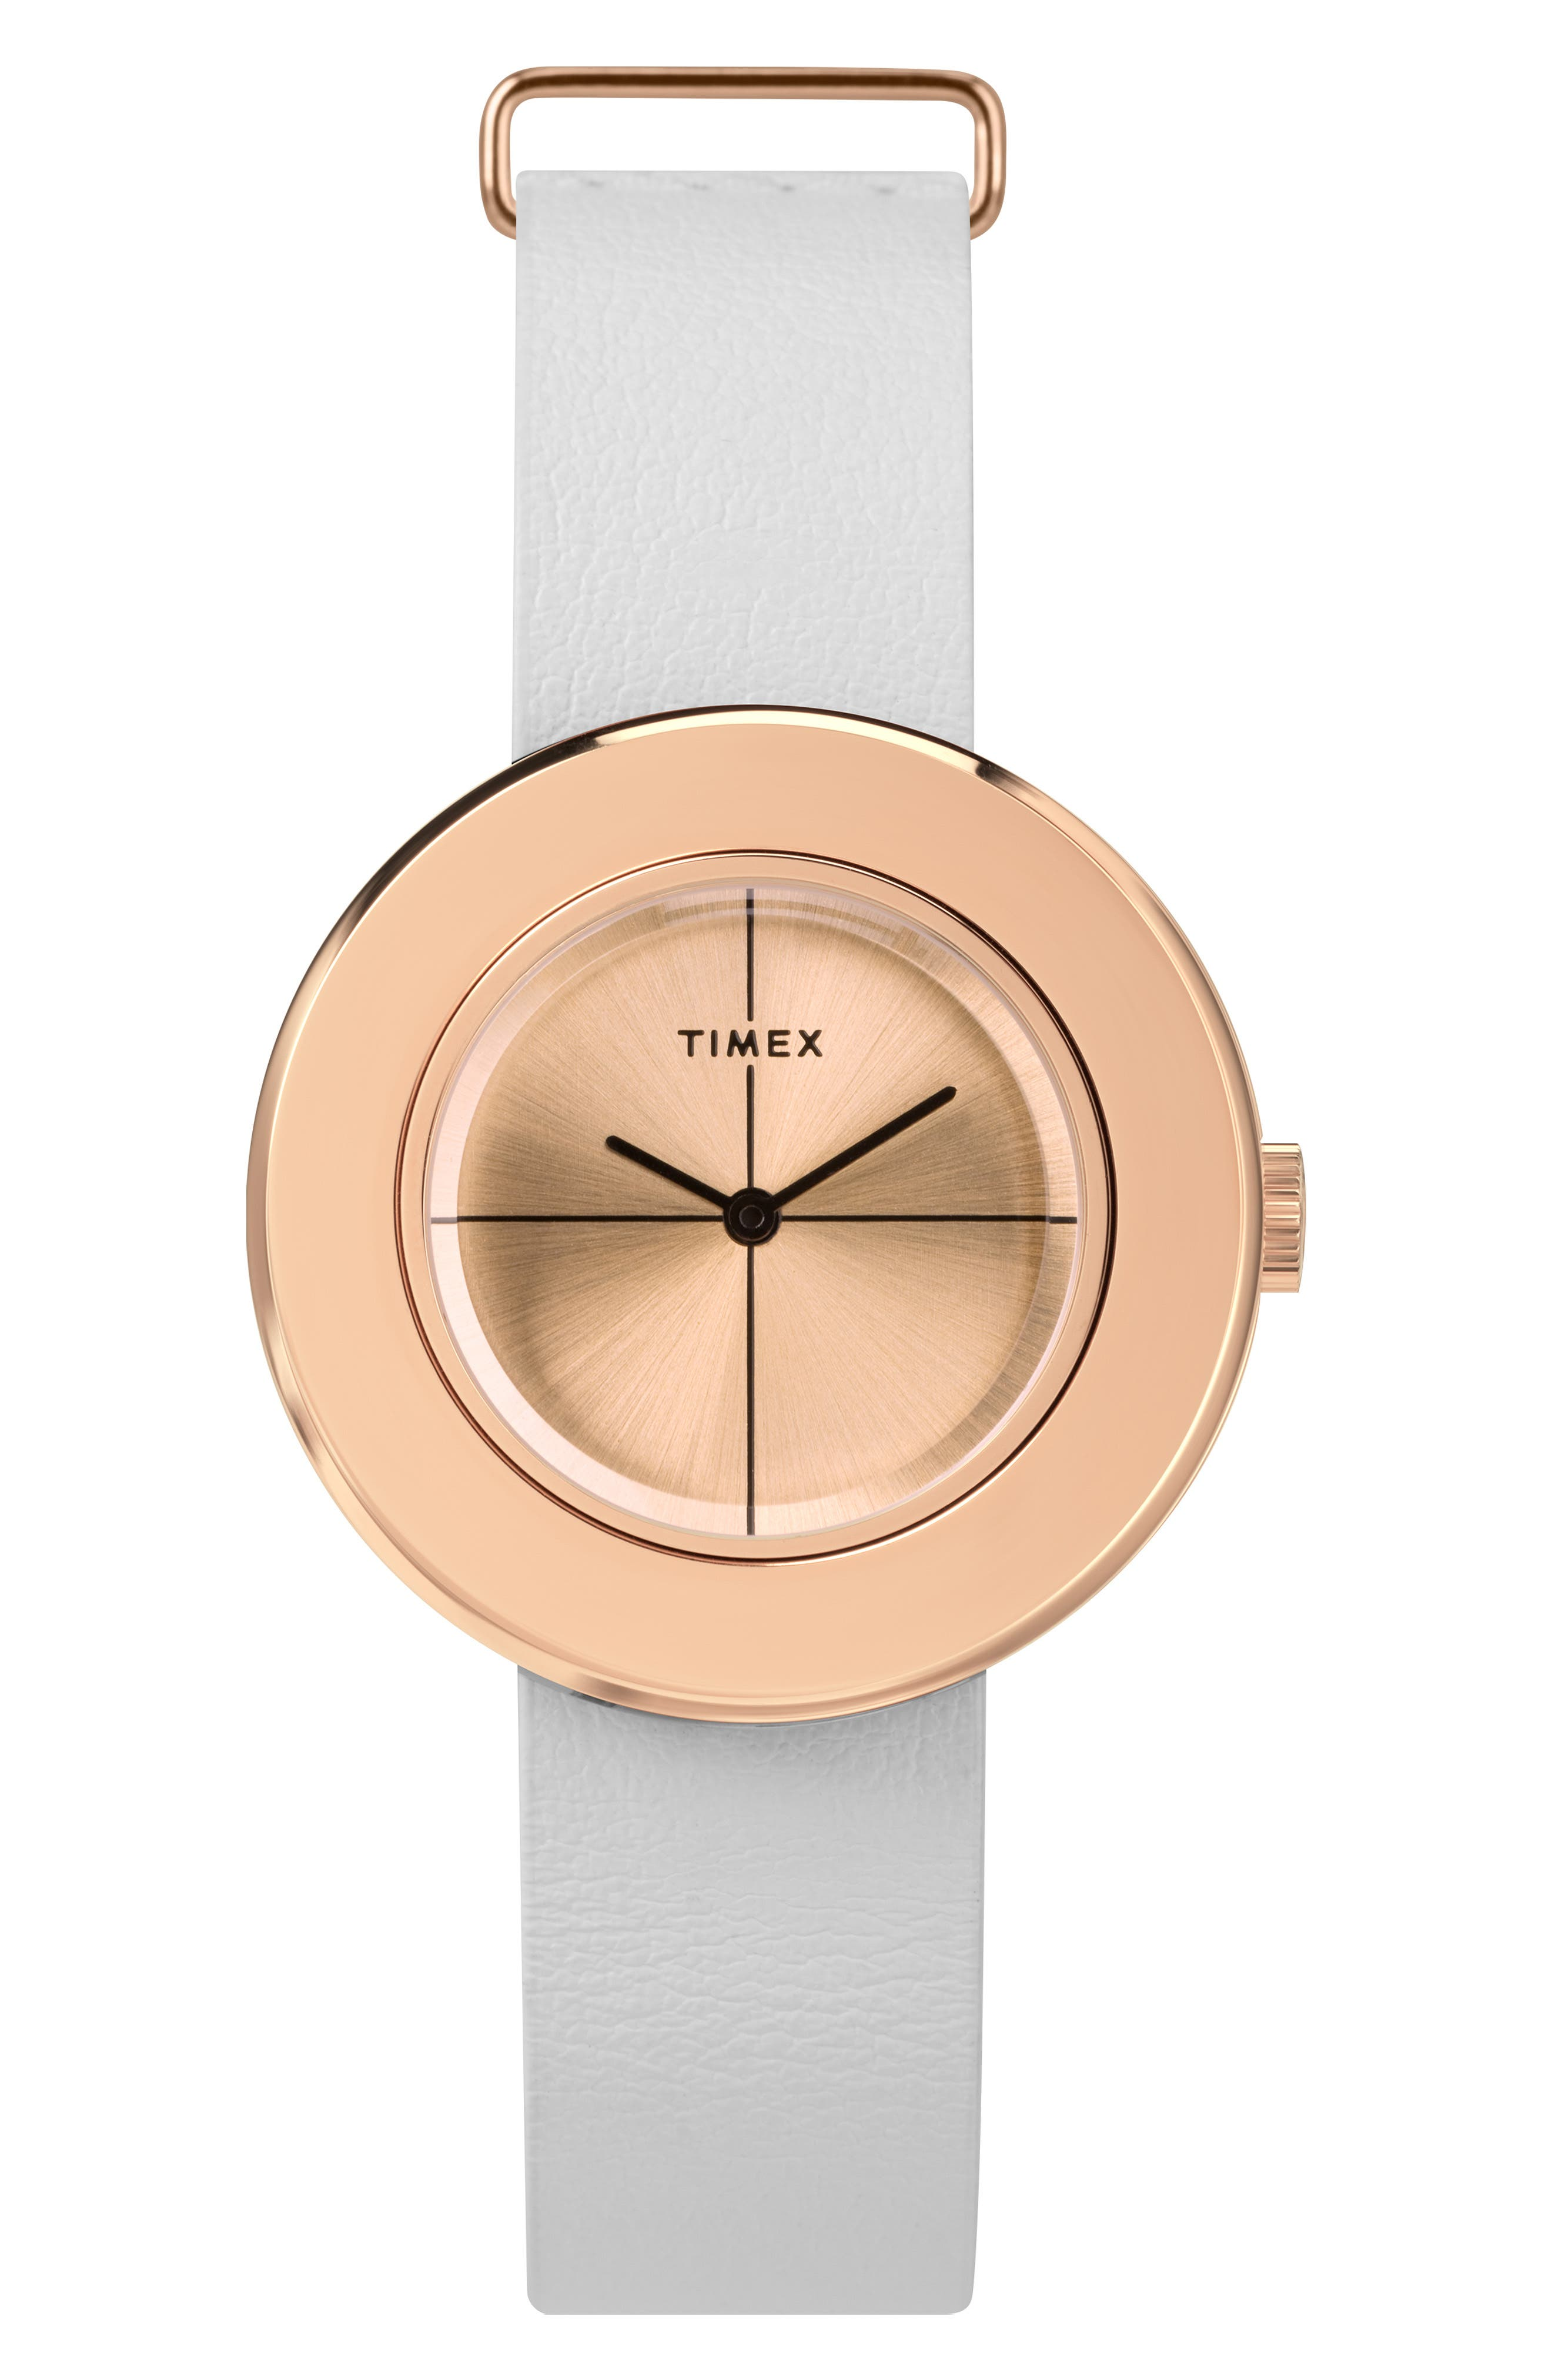 Timex Variety Leather Strap Watch Set,